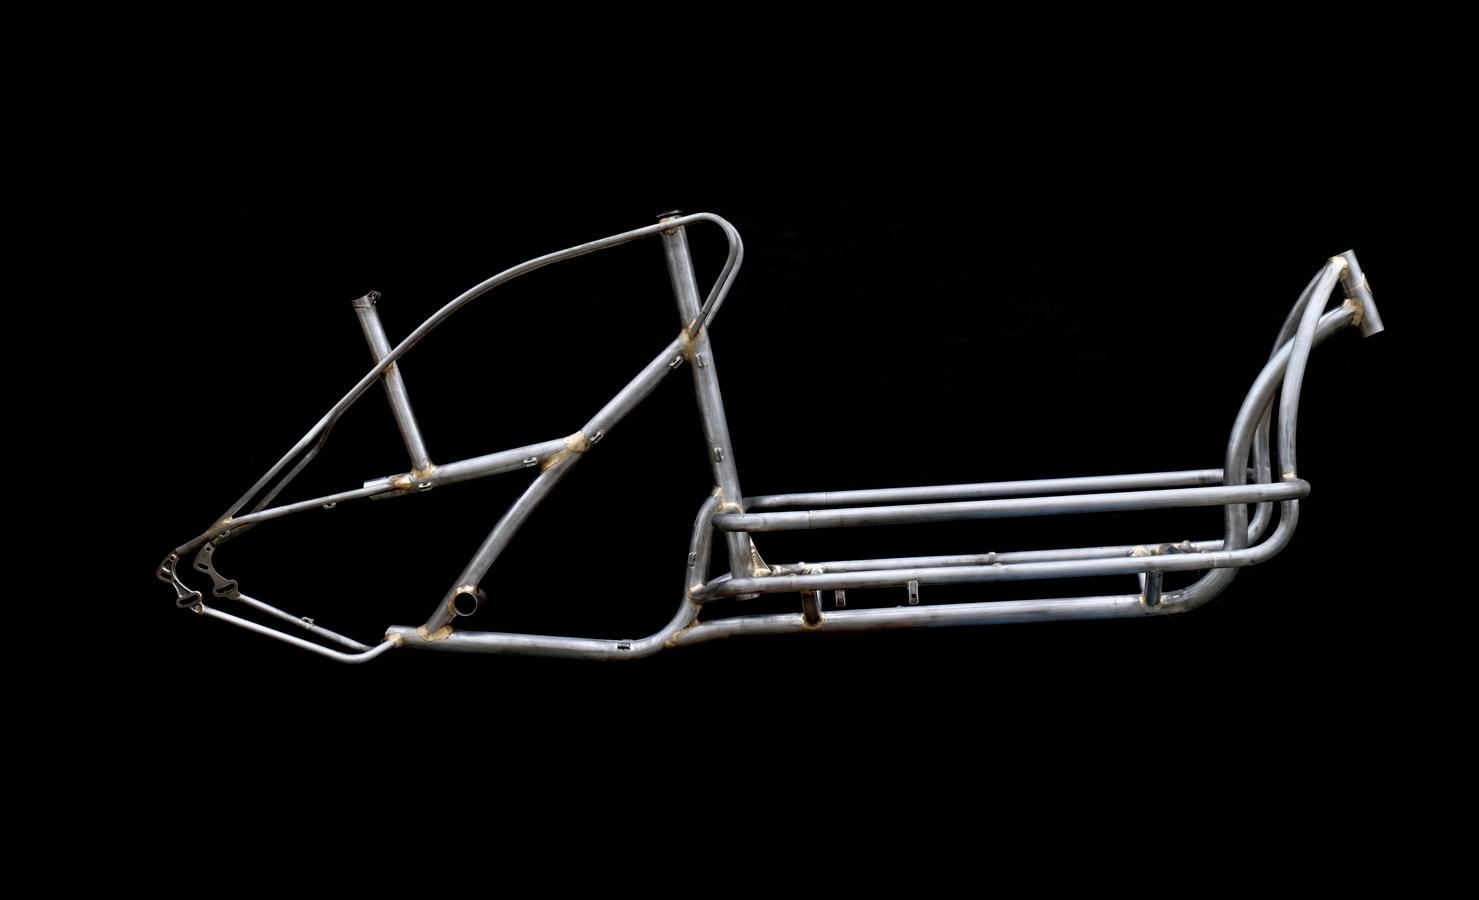 Vélo Taillefer Cycles, Pierre Glottin, Gros porteur, Design:Ben Lelong